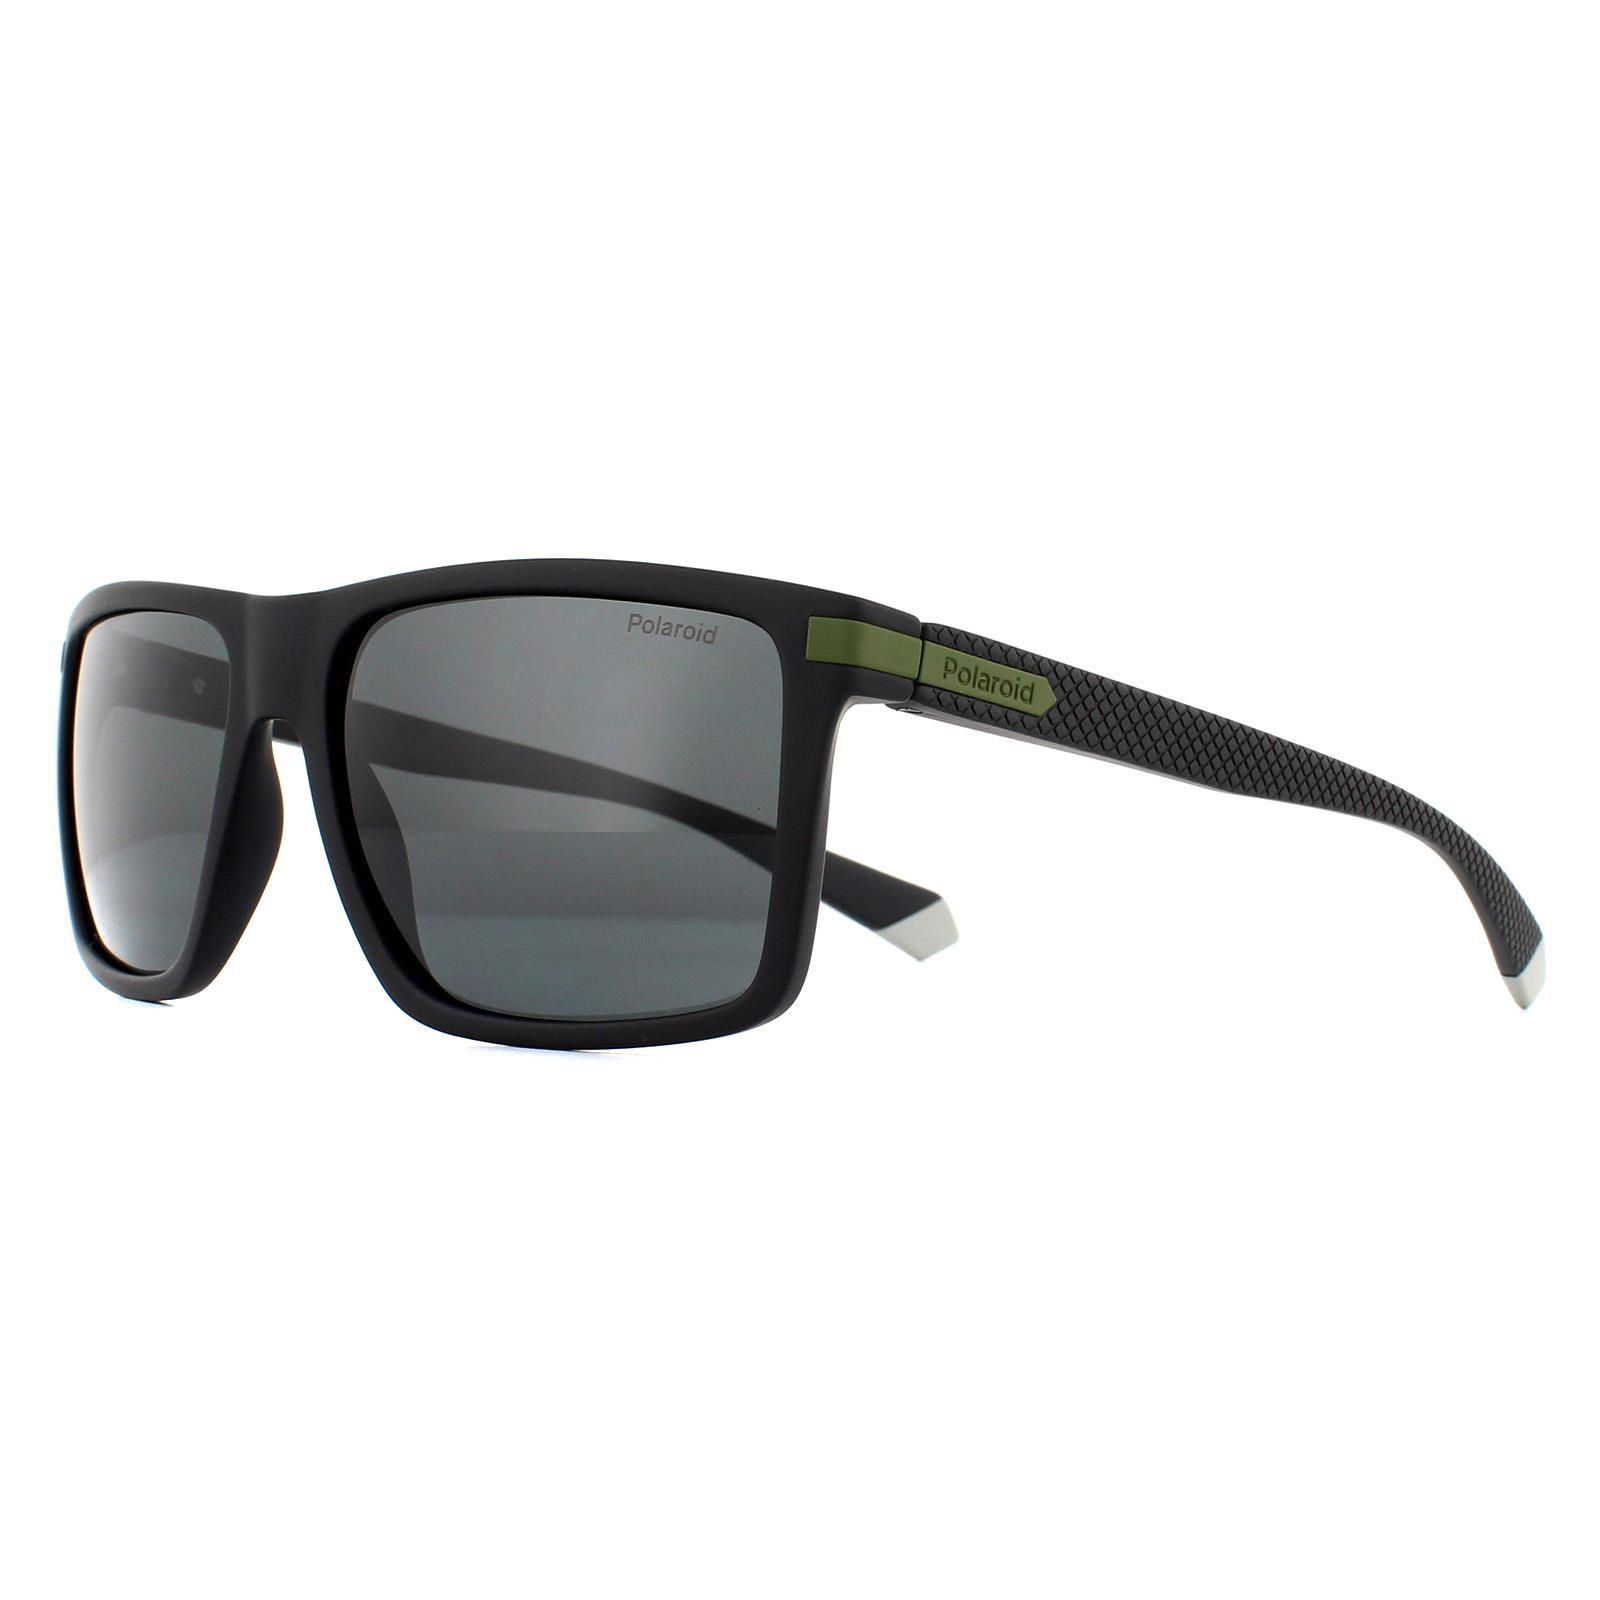 Polaroid Sunglasses PLD 2098/S 7ZJ M9 Black Green Grey Polarized